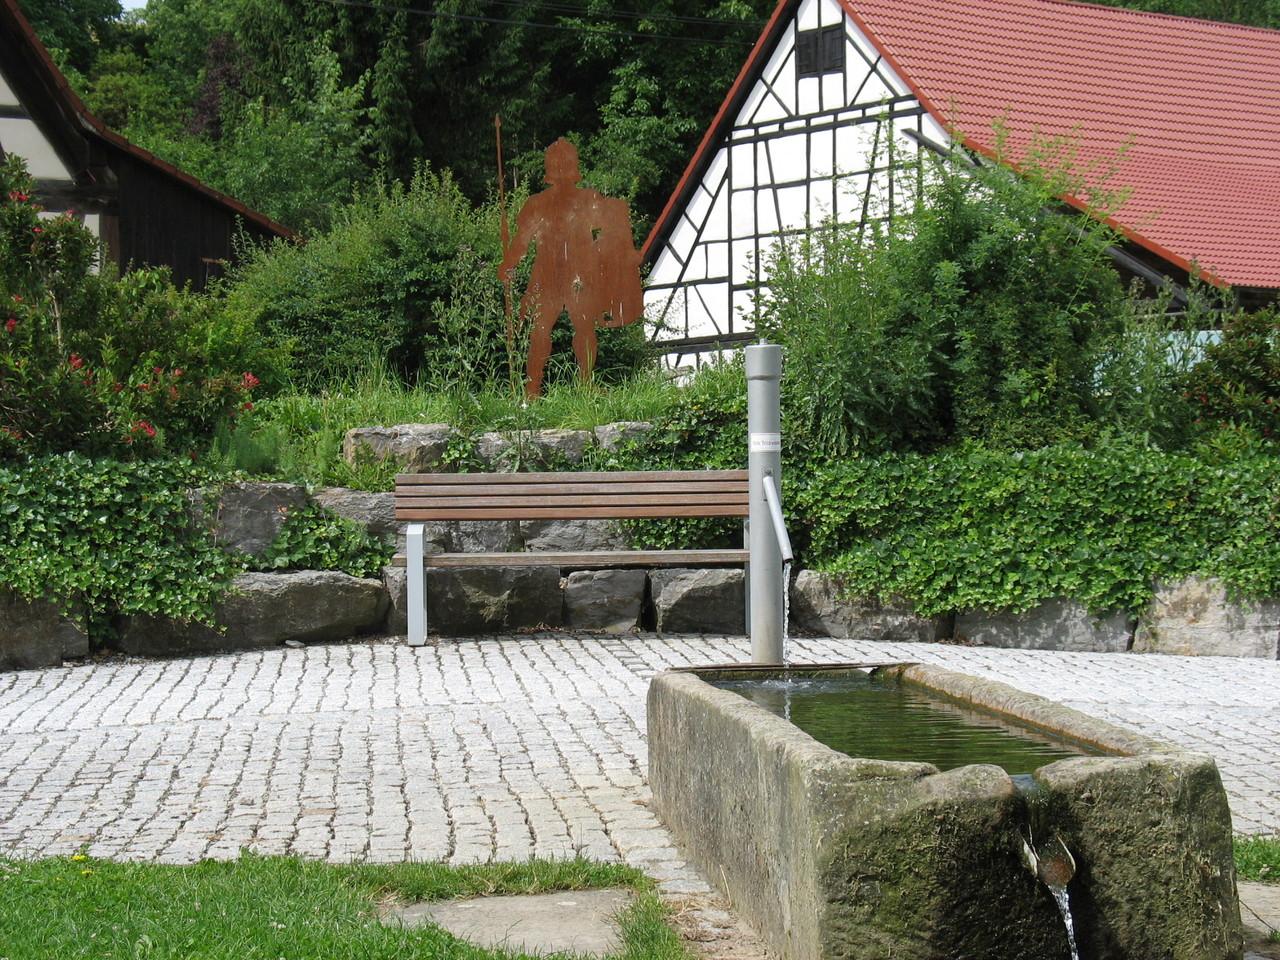 Dorfplatz in Pfahlbach